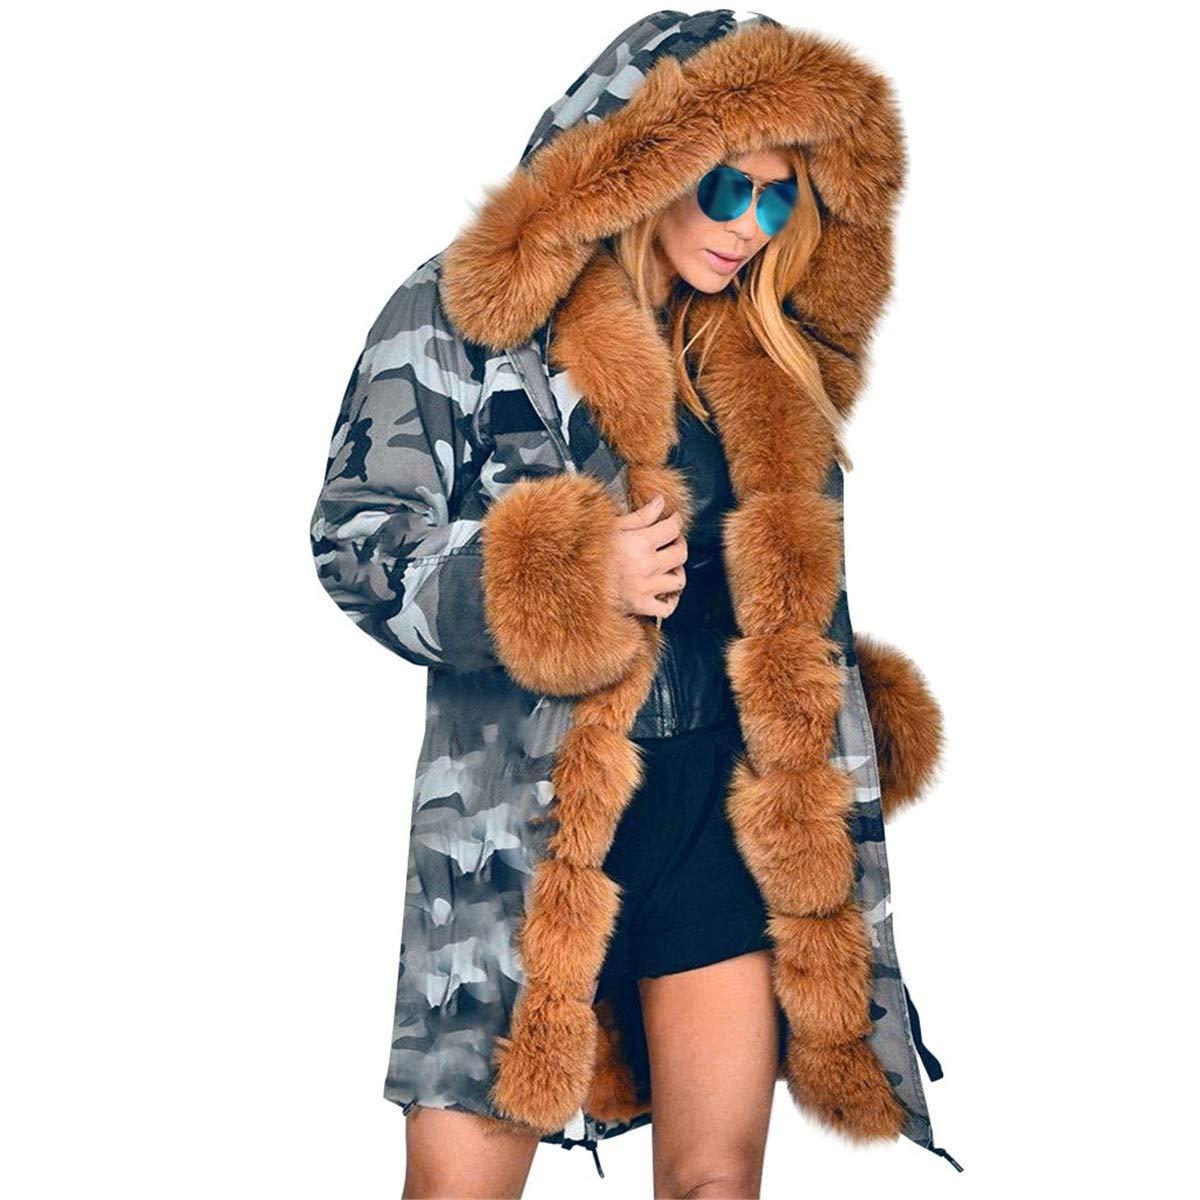 Thenxin Women's Camouflage Hooded Thicken Winter Coat Faux Fur Warm Overcoat Jacket Long Outwear(Brown,M) by Thenxin